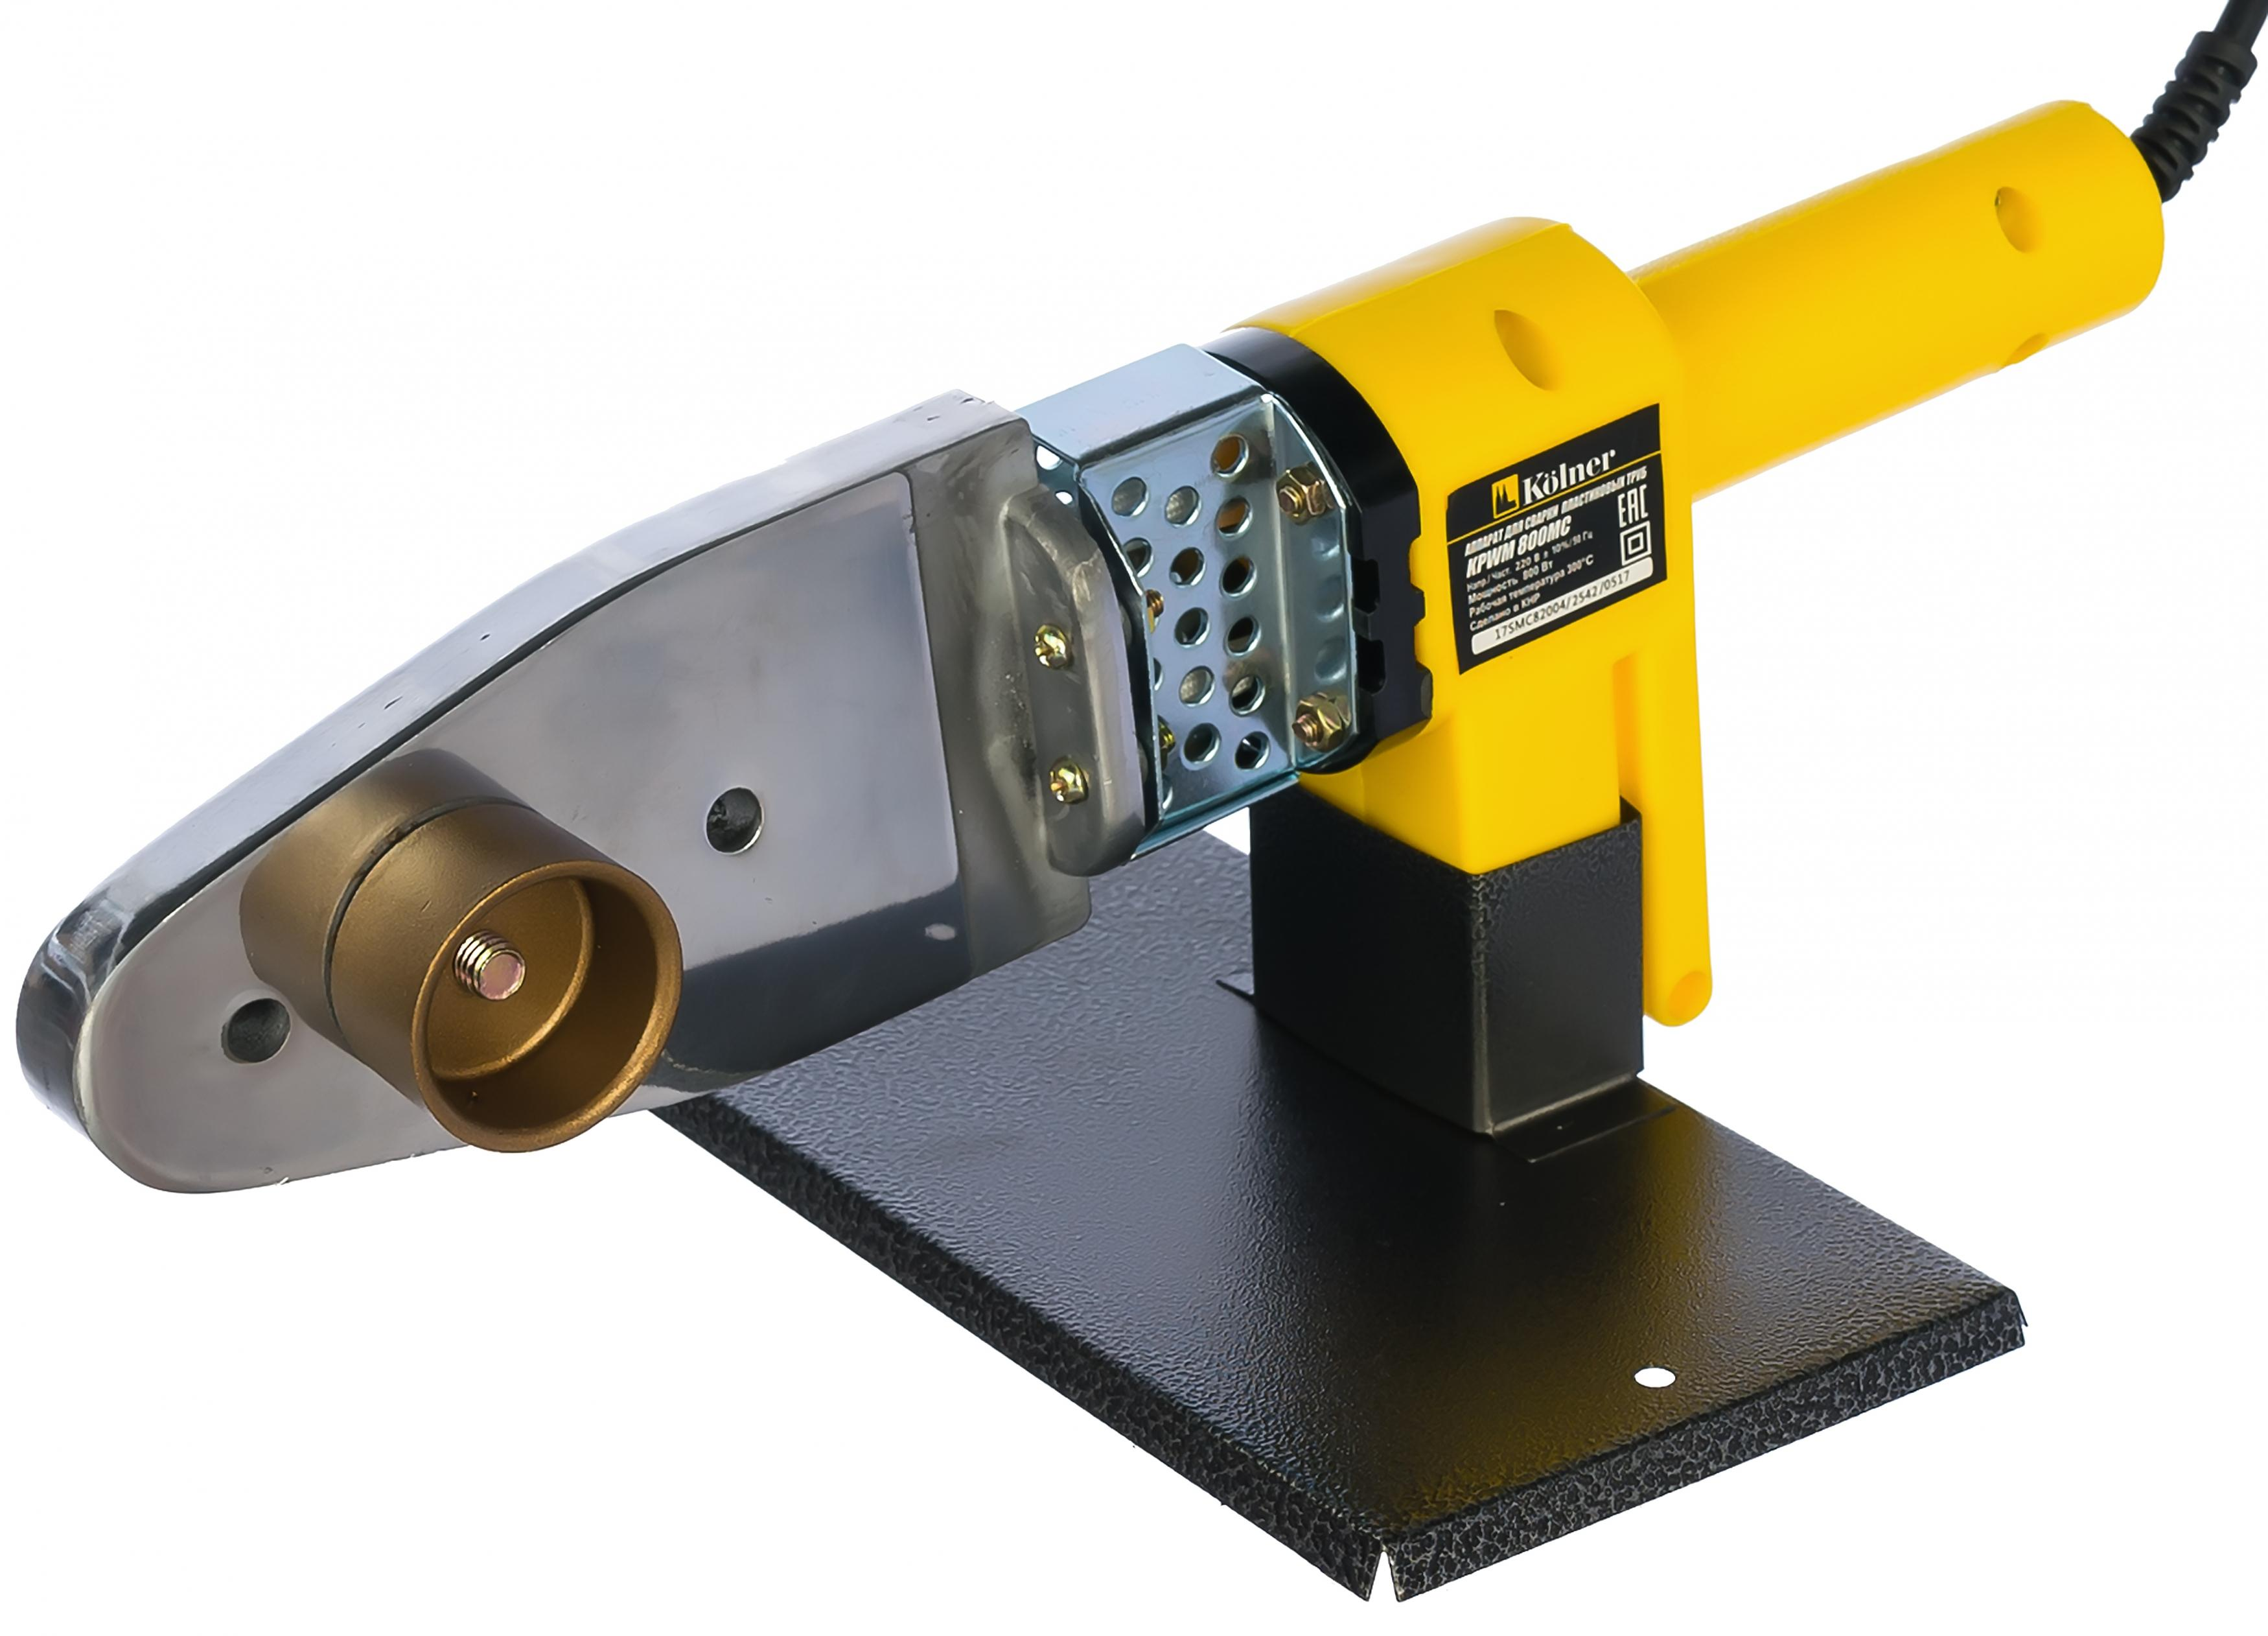 Аппарат для сварки пластиковых труб Kolner 800 Мc аппарат для сварки полипропиленовых труб bort brs 2000